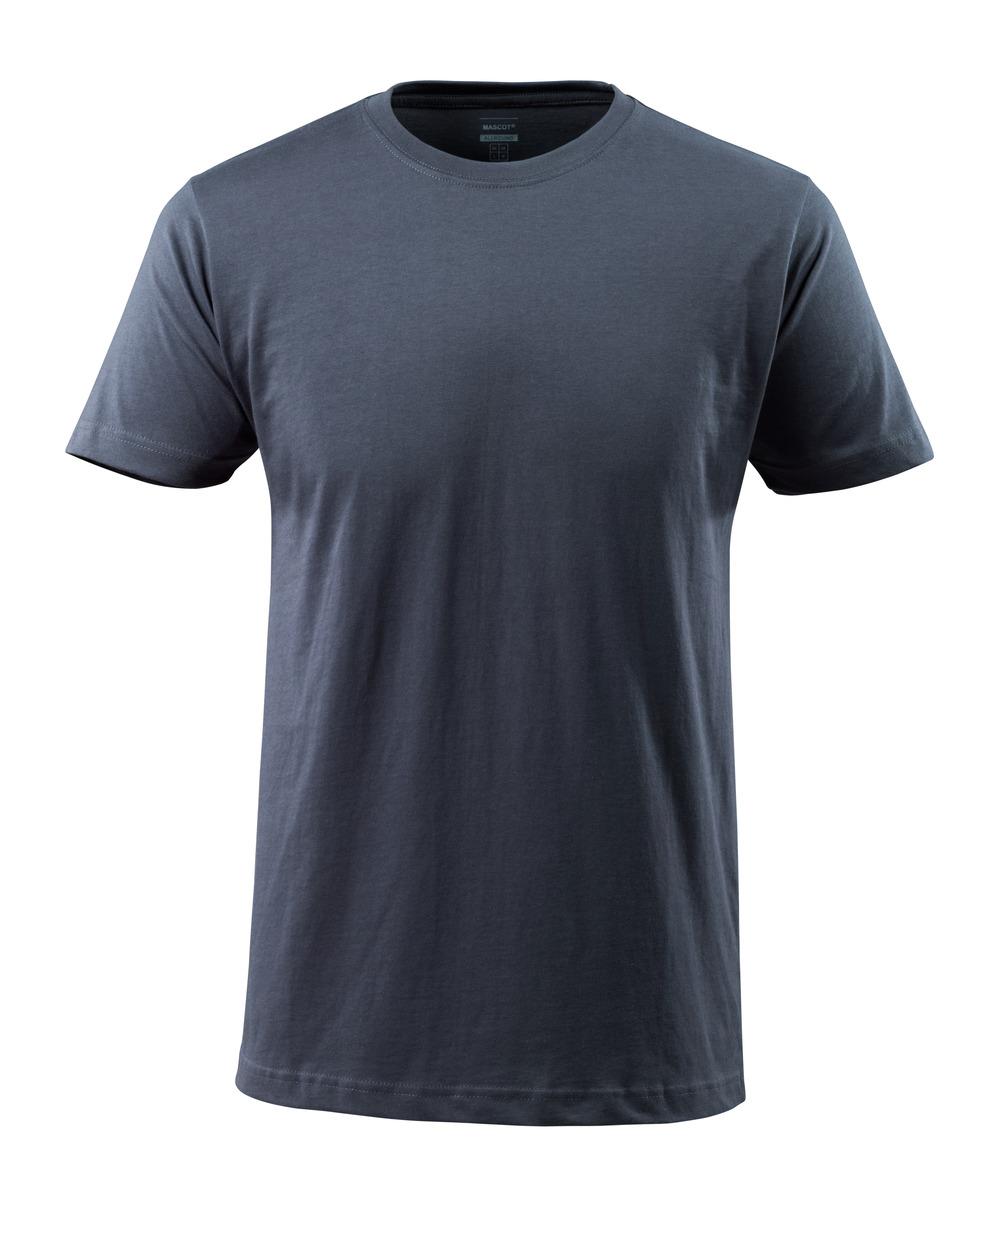 50662-965-010 T-shirt - dark navy